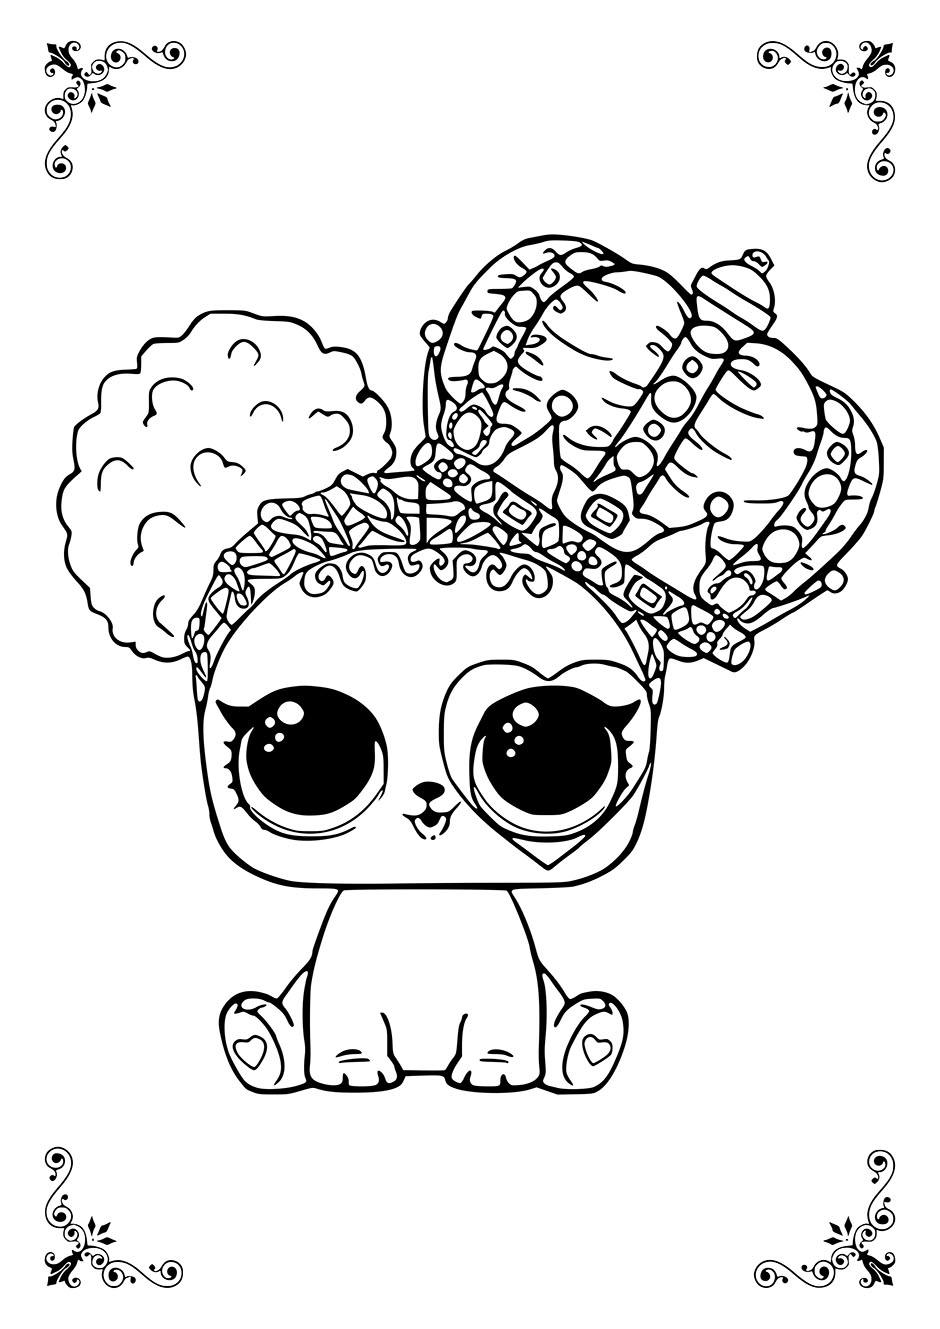 Раскраска: кукла ЛОЛ кошка-королева — raskraski-a4.ru